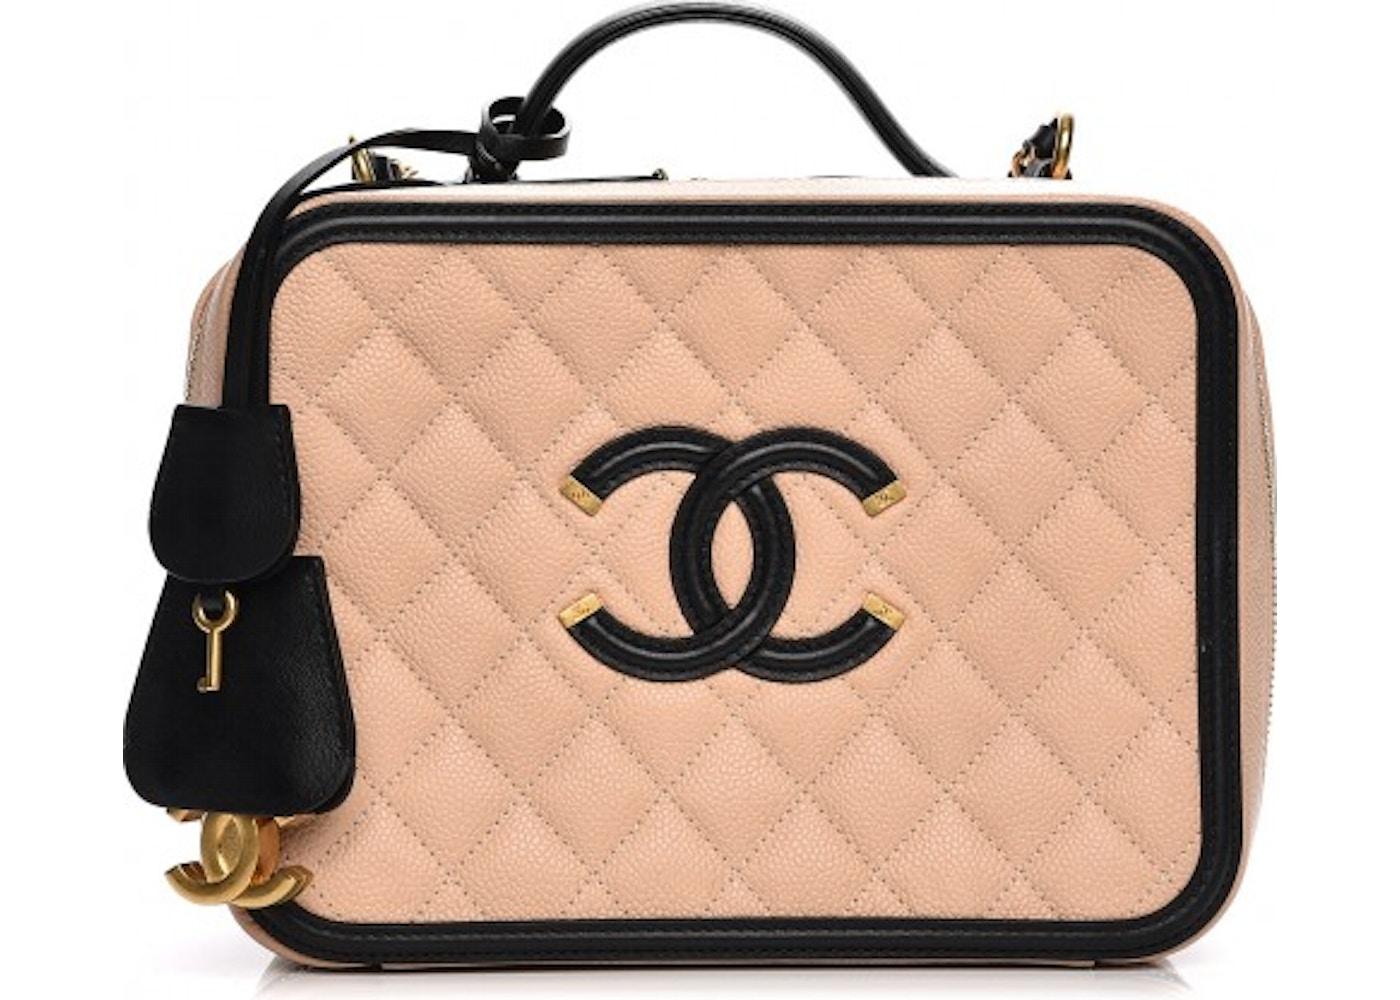 beb475974f14 Chanel Filigree Vanity Case Diamond Quilted CC Large Beige/Black